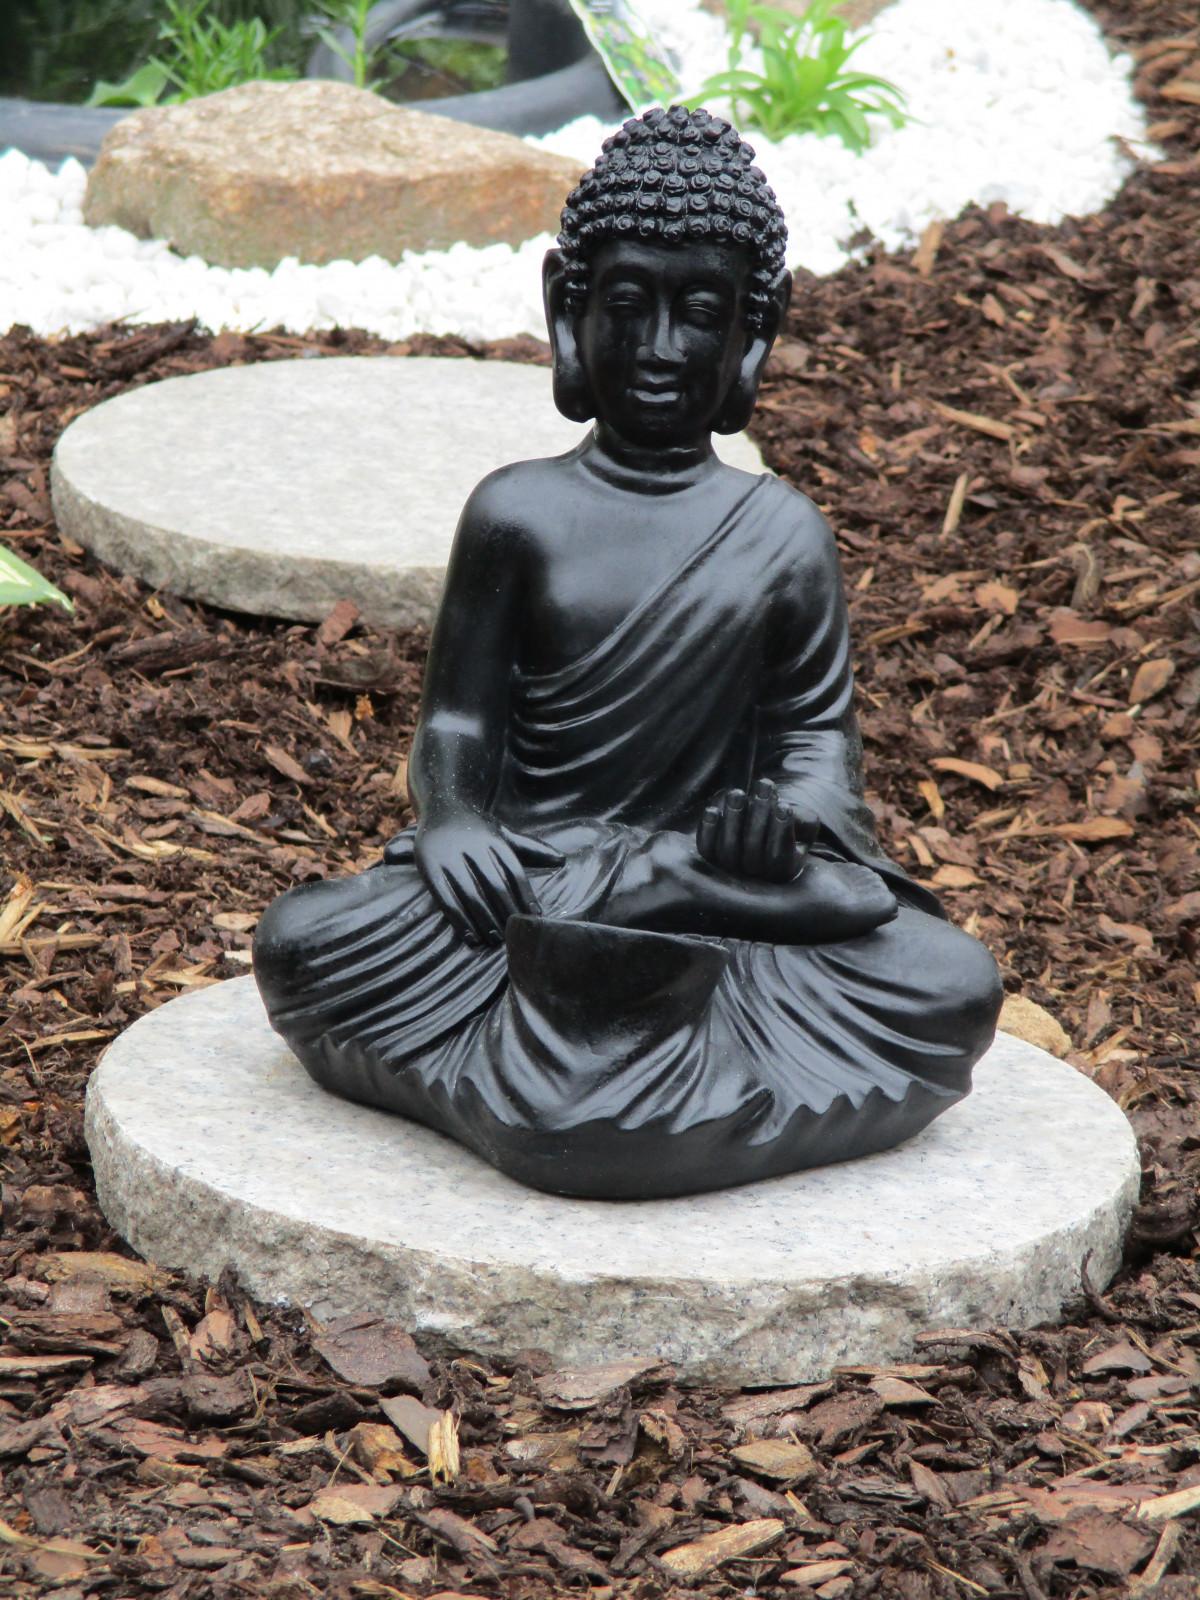 piedra monumento estatua budista asia negro